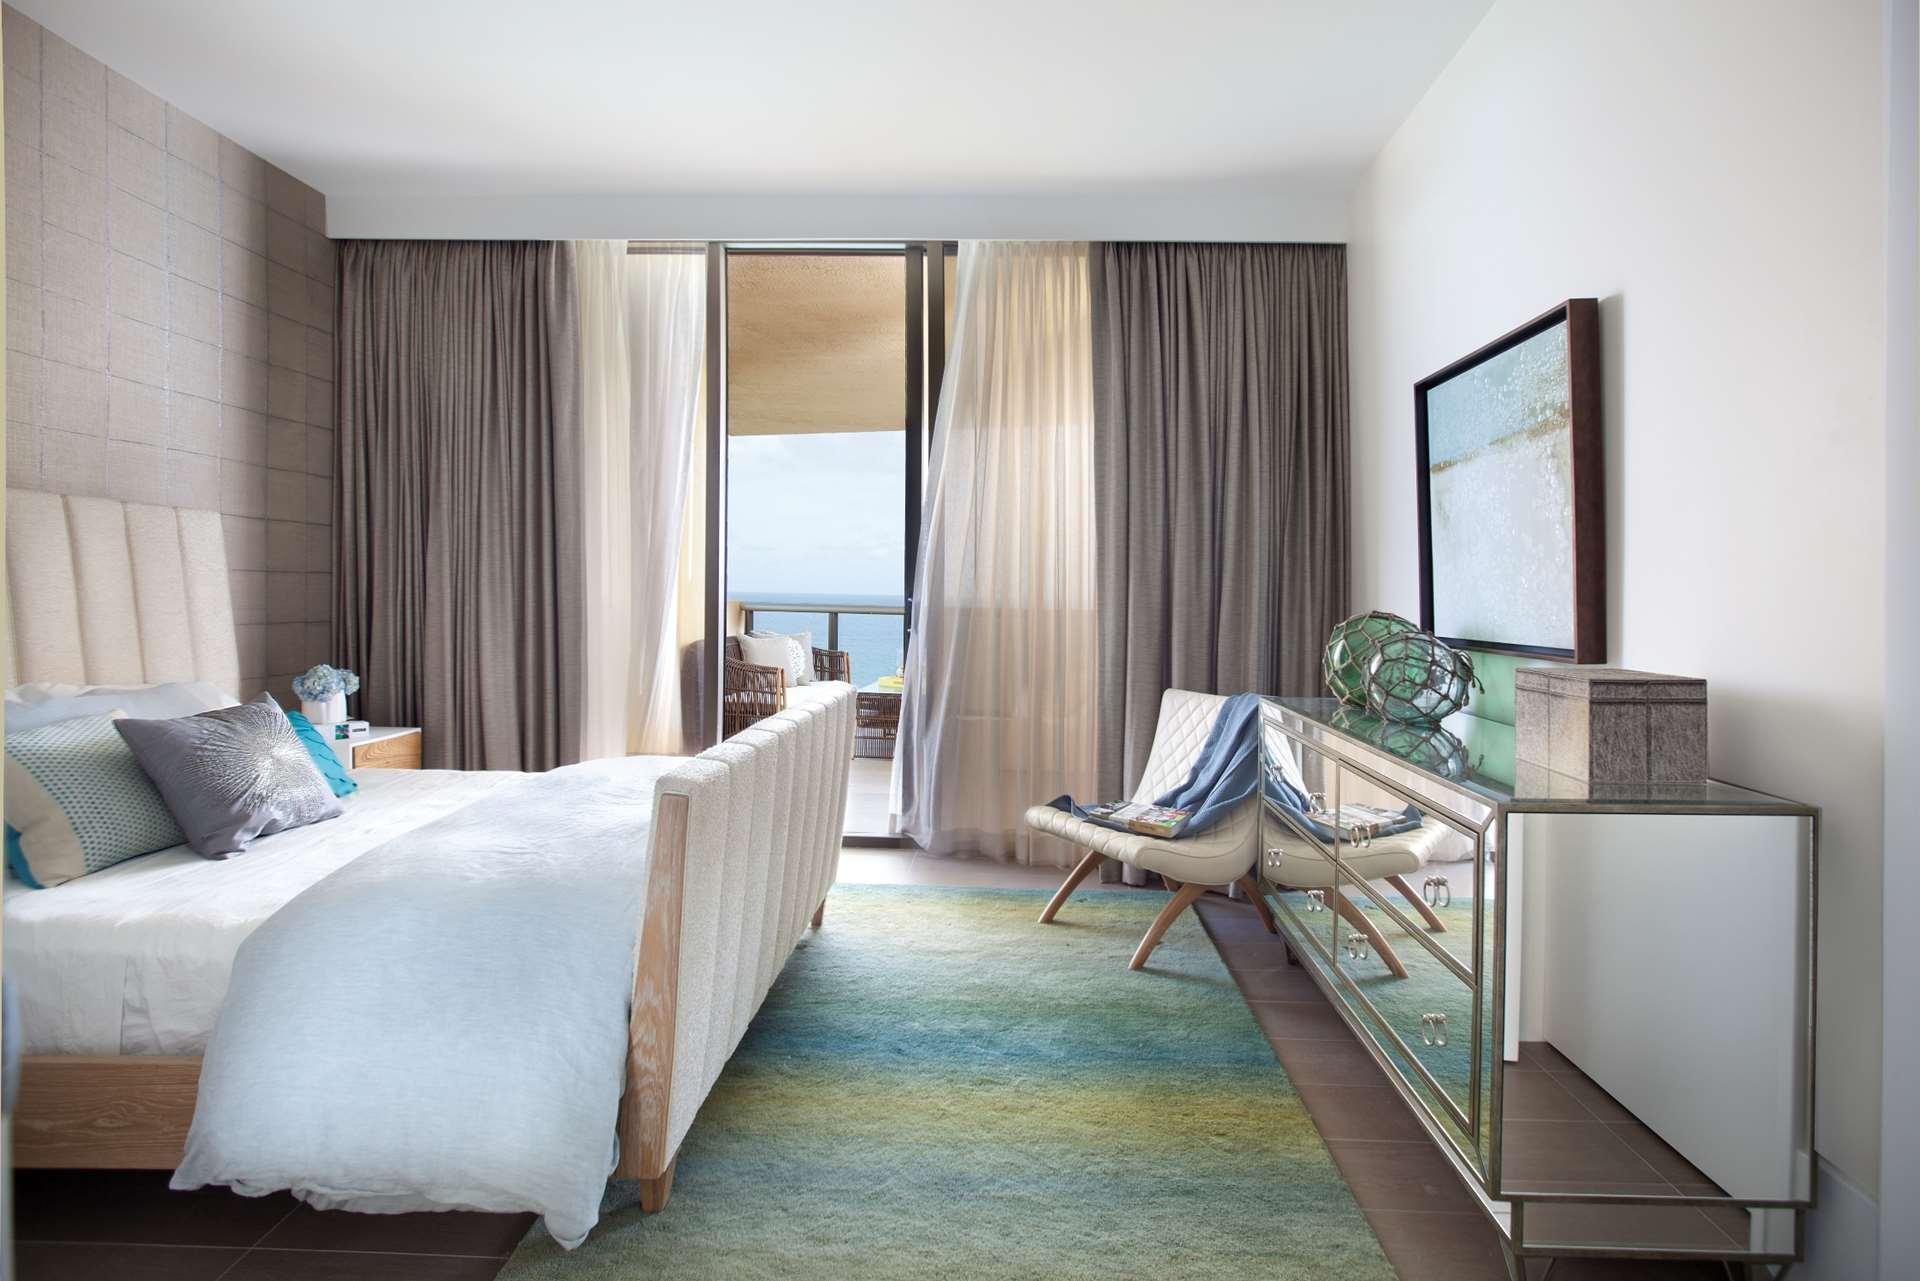 Miami Interior Design Guest Bedroom